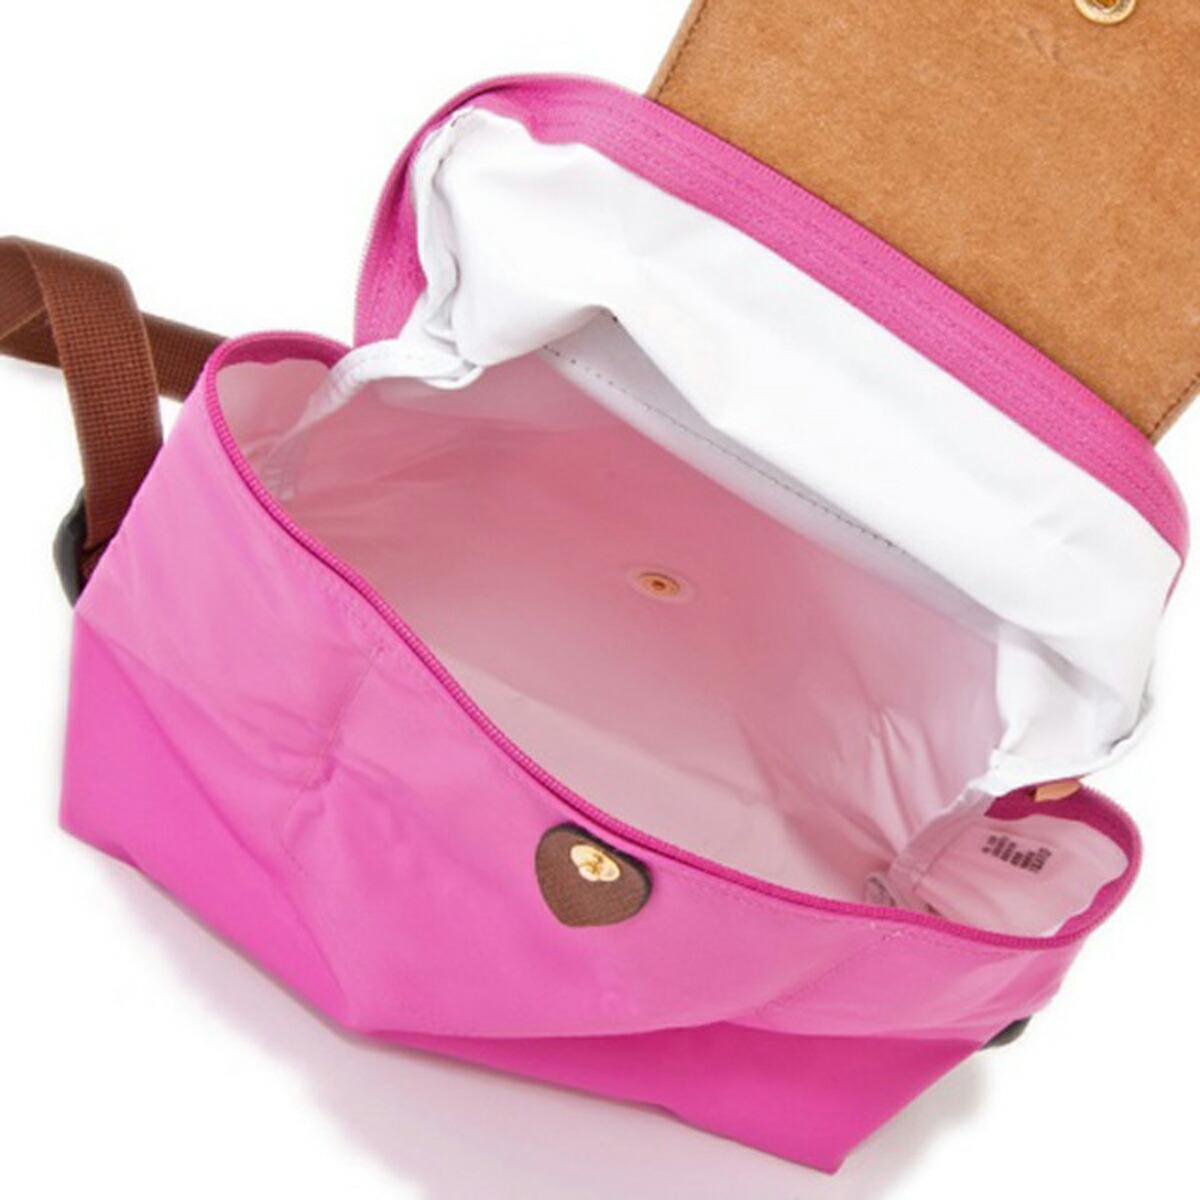 ????? LONGCHAMP ?·?????? ?????? 1699 089 168 ?????? Bubble pink